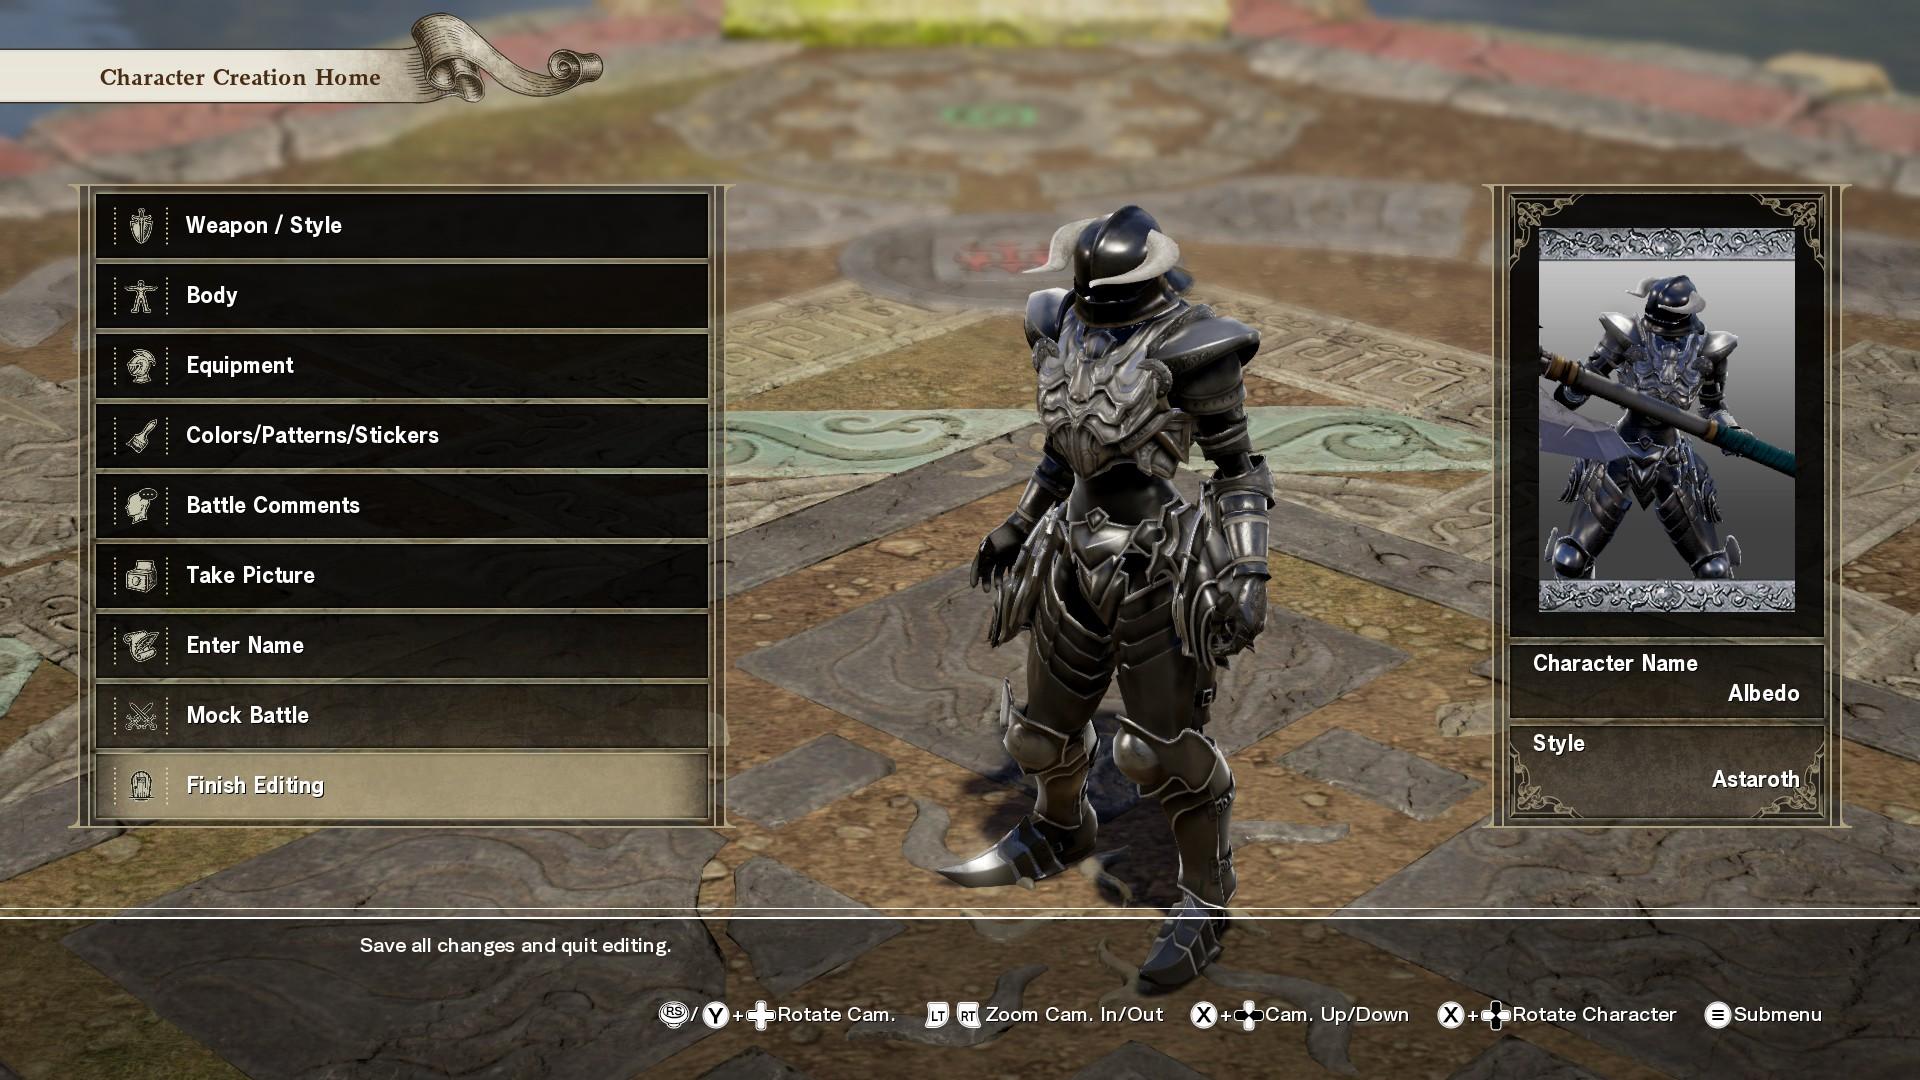 Steam Community :: Screenshot :: Albedo in Armor (Overlord)